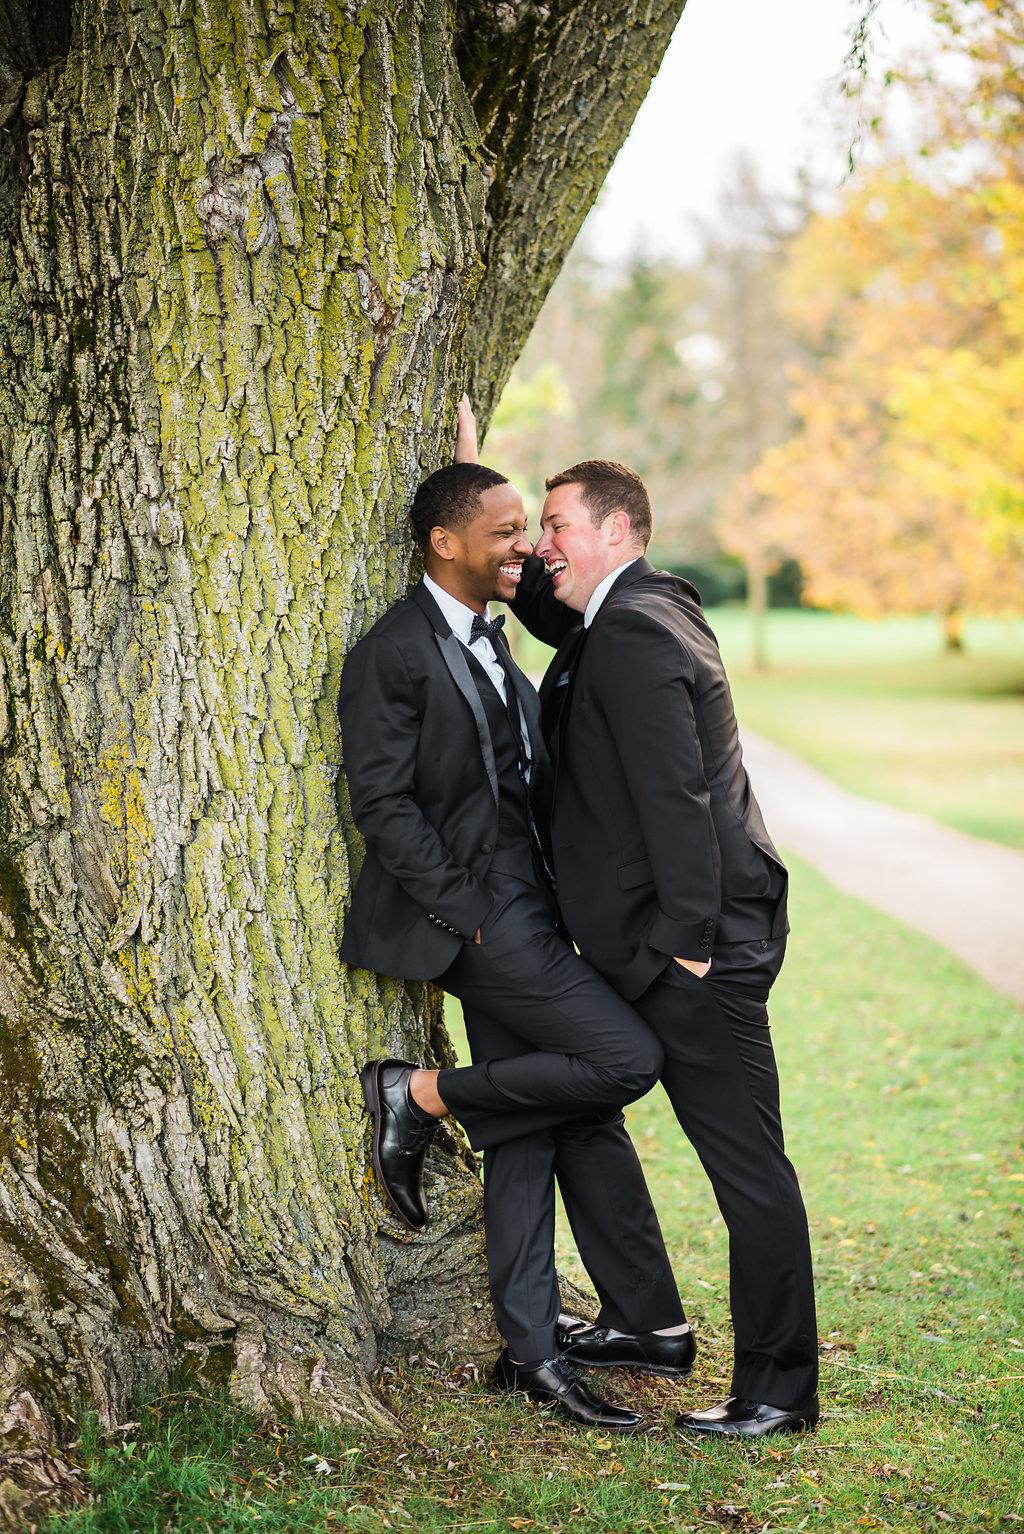 RiverClubofMequon-MequonWI-LGBT-Gay-StyledShoot-99.jpg